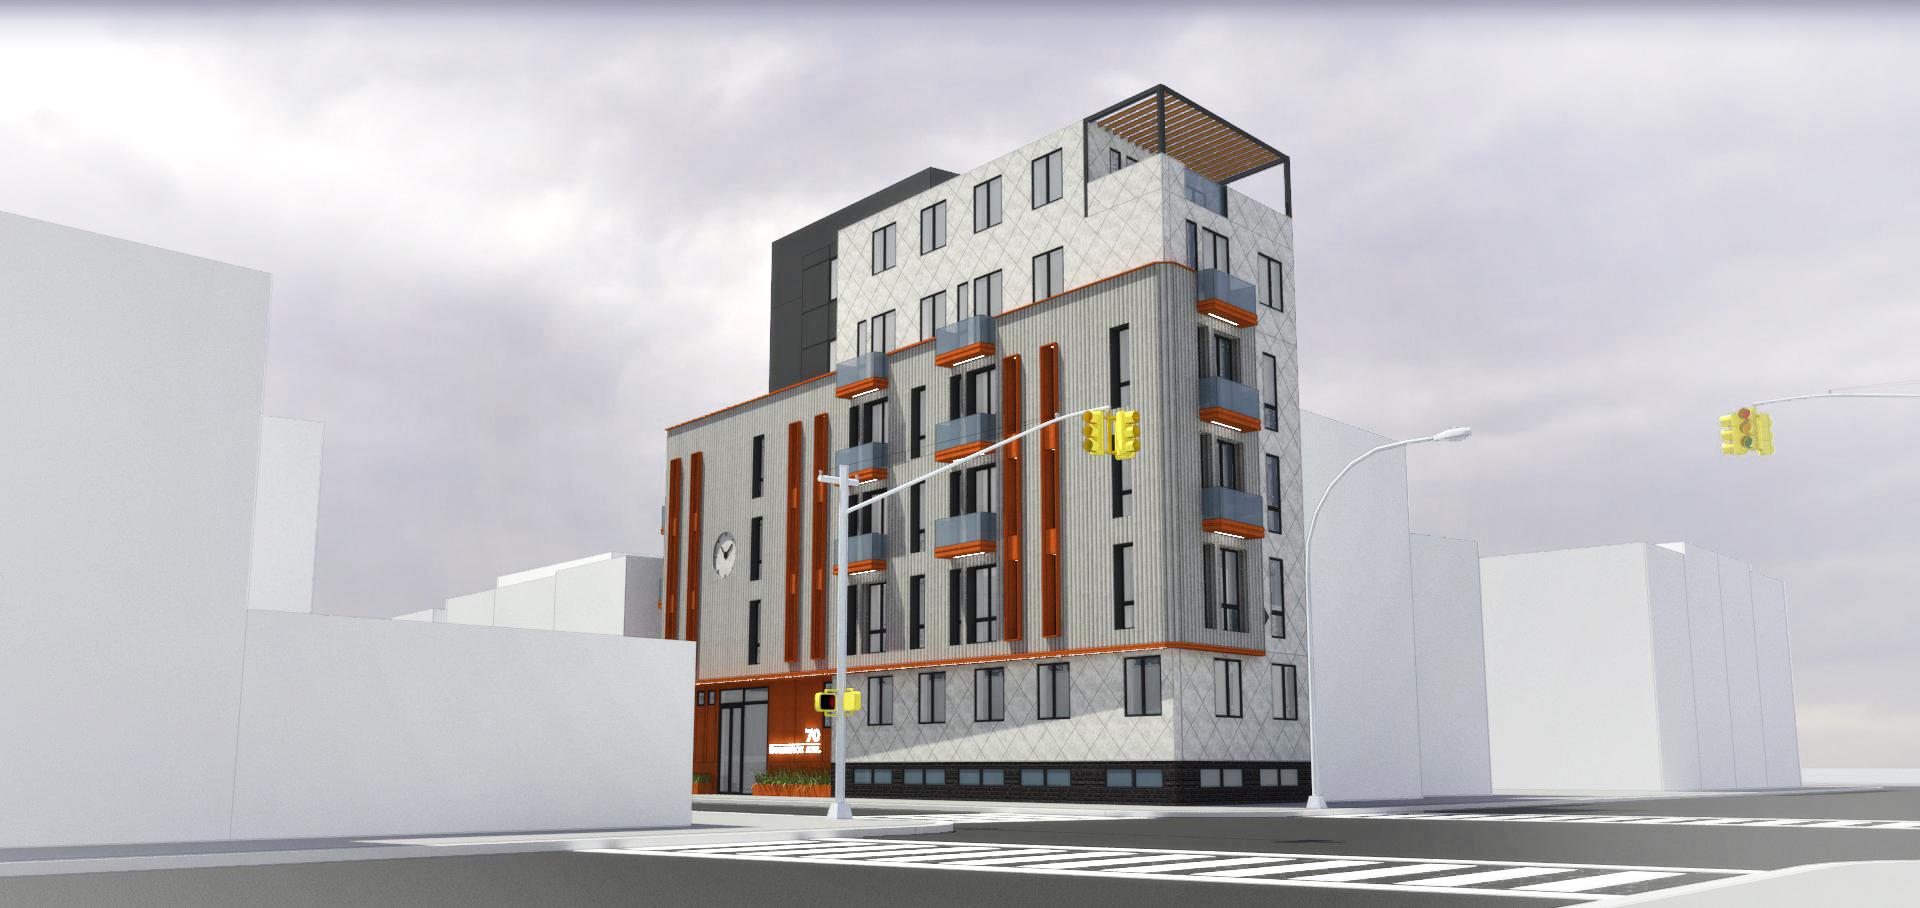 70 Bushwick Avenue, rendering by Input Creative Studio